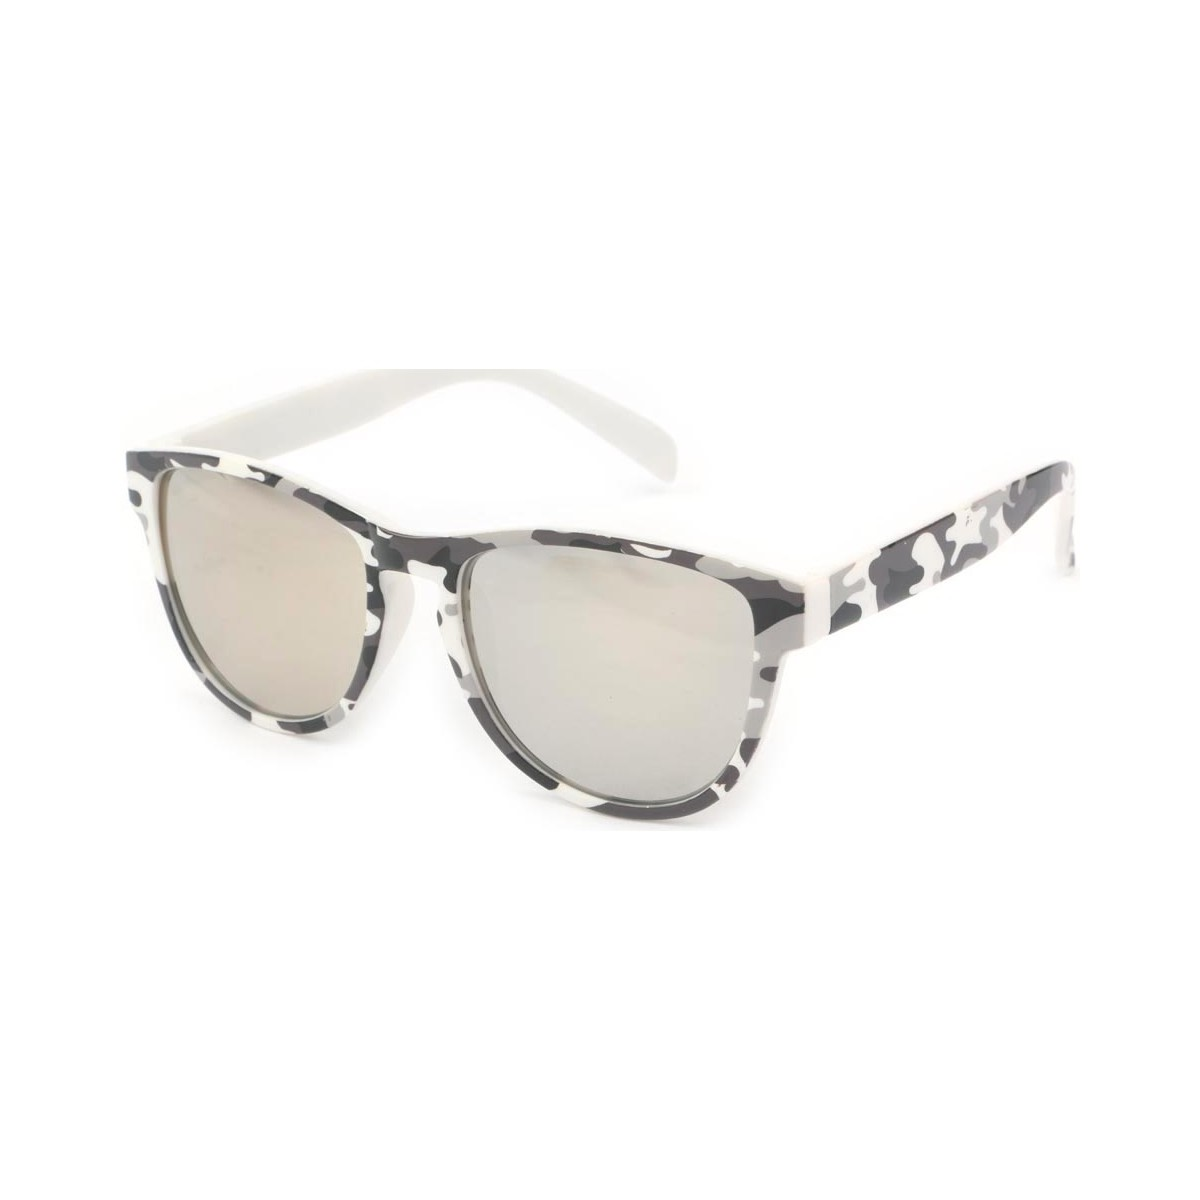 Eye Wear Lunettes Soleil Fool Love monture Camouflage Blanc Marron